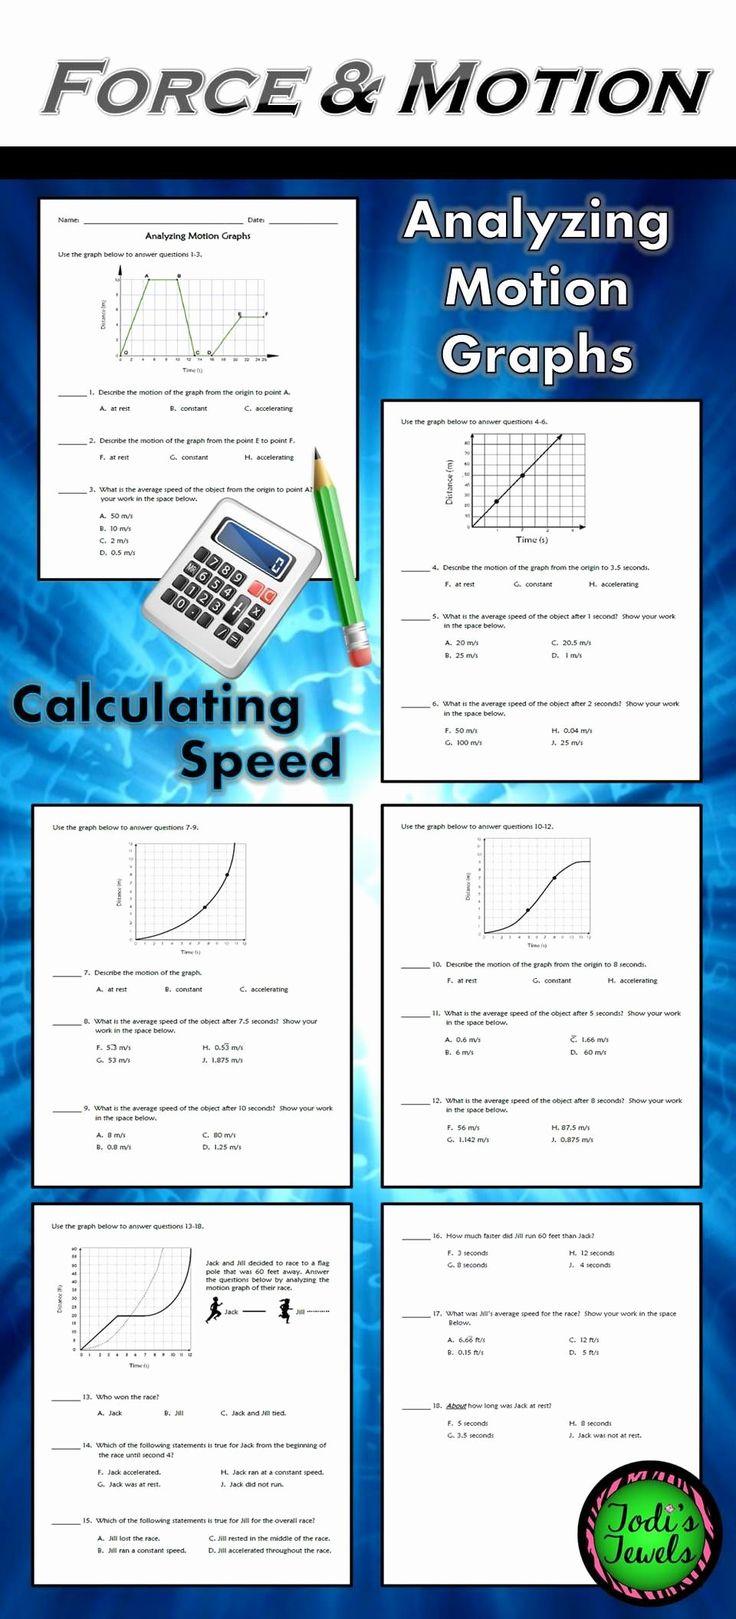 Interpreting Motion Graphs Worksheet Answers Beautiful